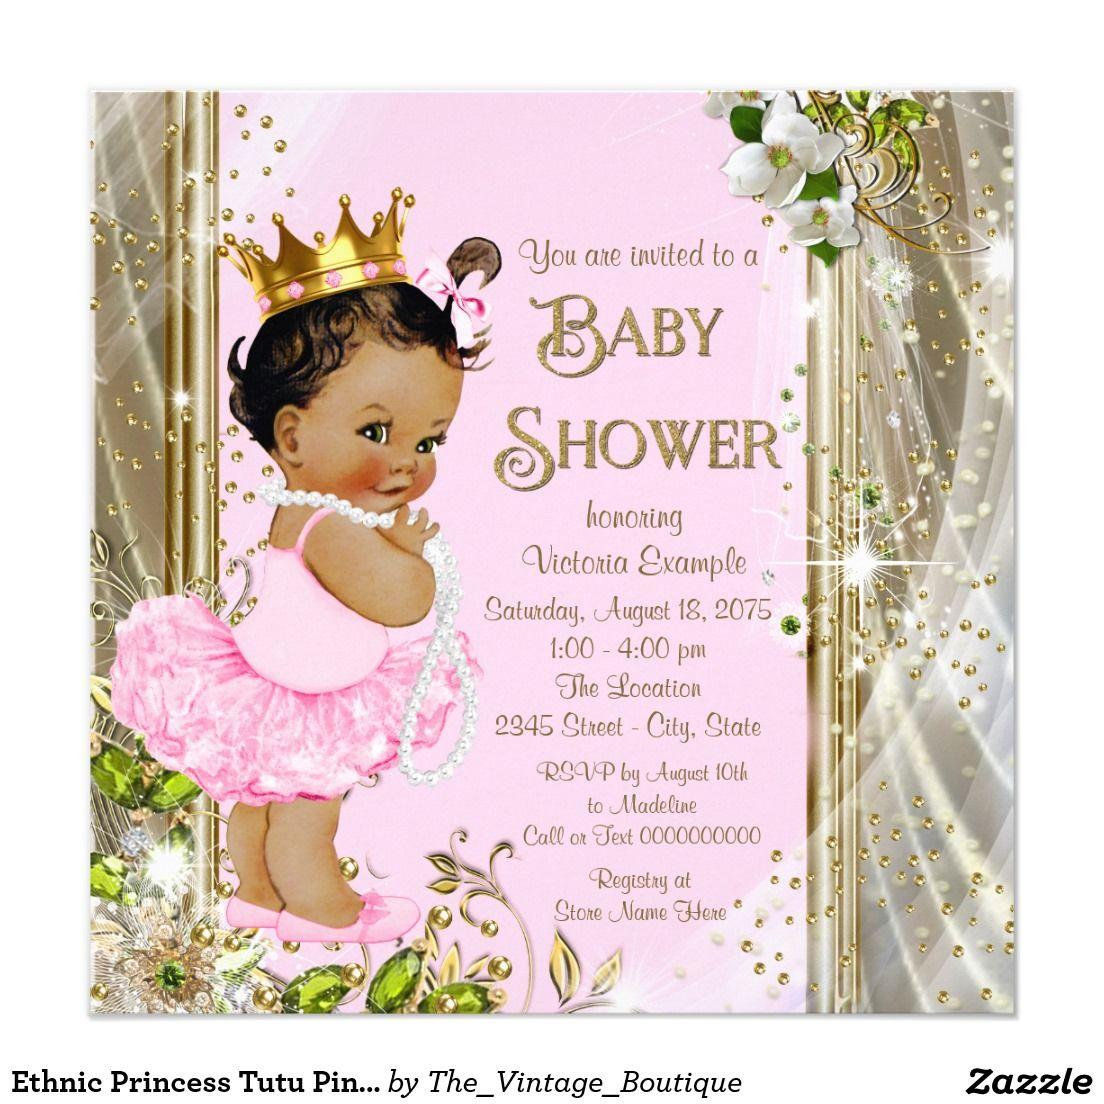 Ethnic Princess Tutu Pink Gold Baby Shower Card | Baby shower ...